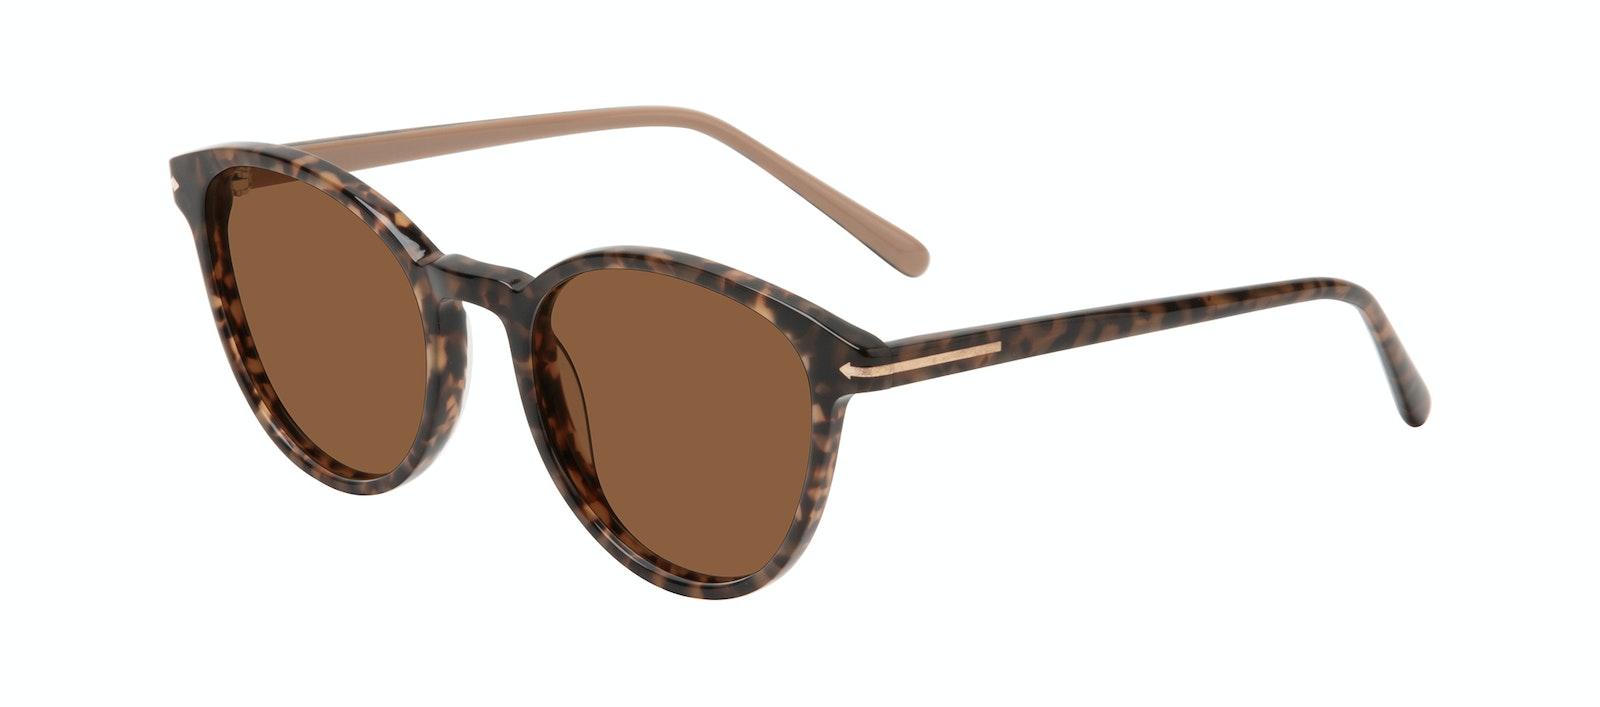 Affordable Fashion Glasses Round Sunglasses Women London Leo Tilt